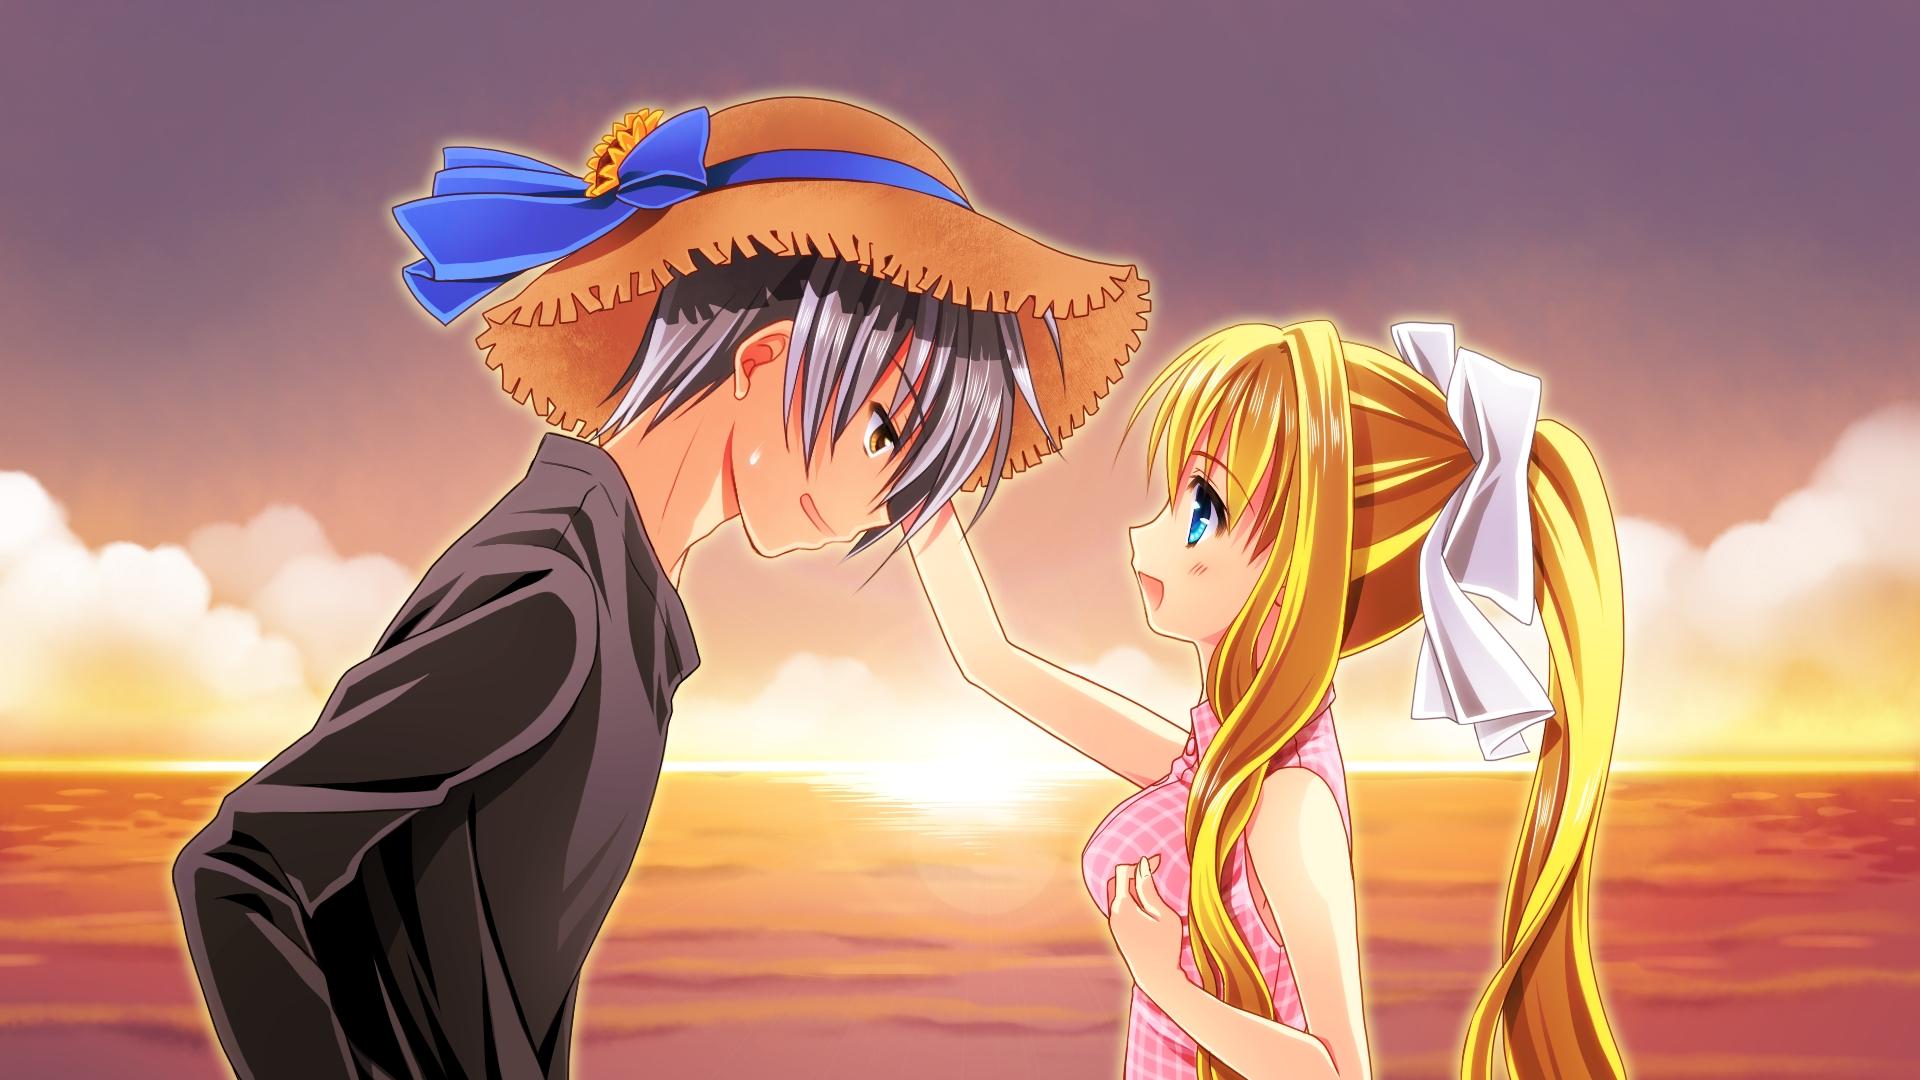 Air wallpaper zerochan anime image board - Anime backdrop wallpaper ...